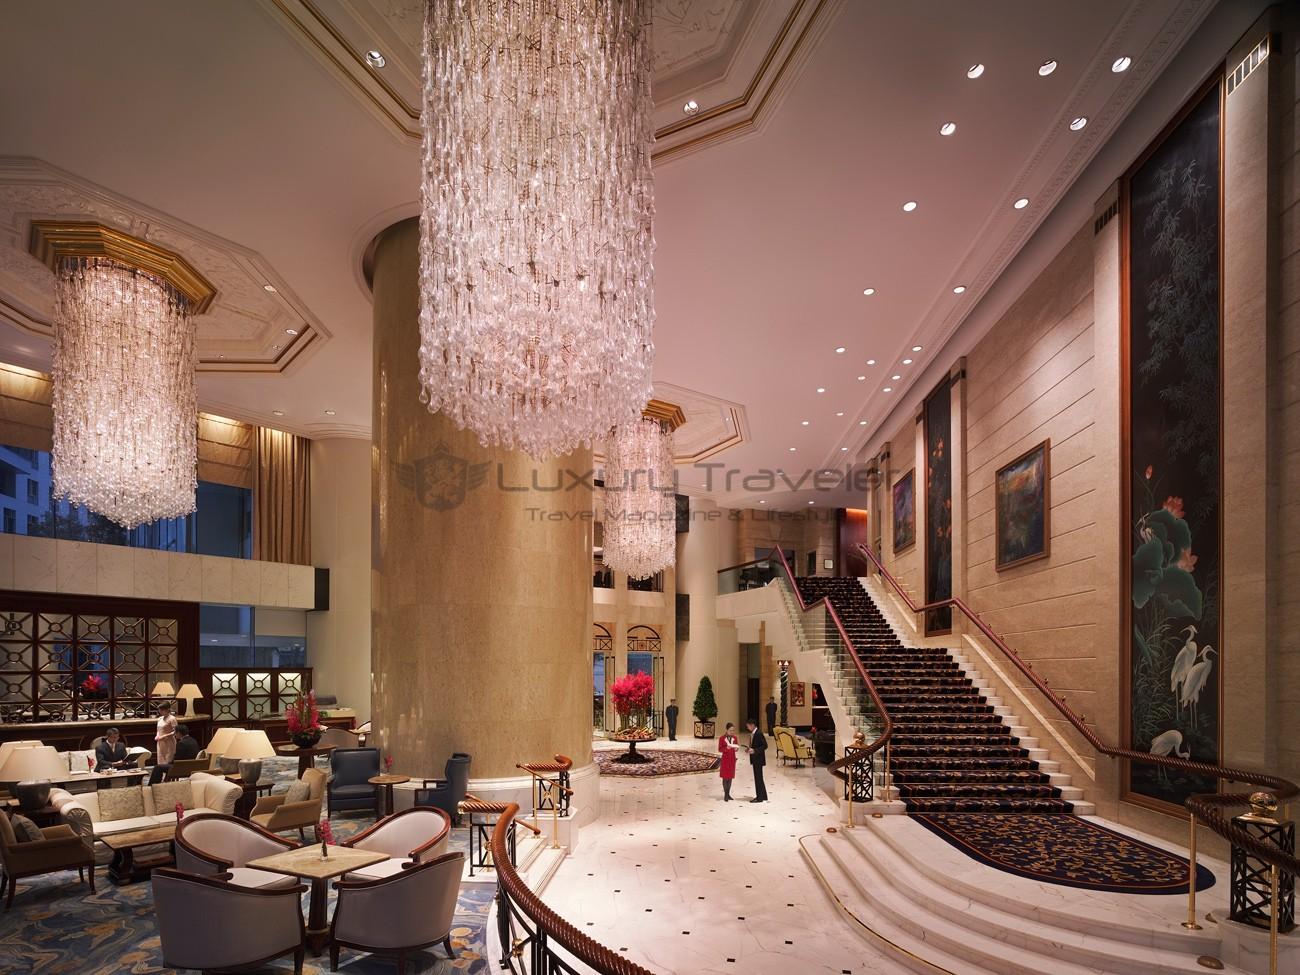 Island_Shangri-La_Hotel_Hong_Kong_Lobby